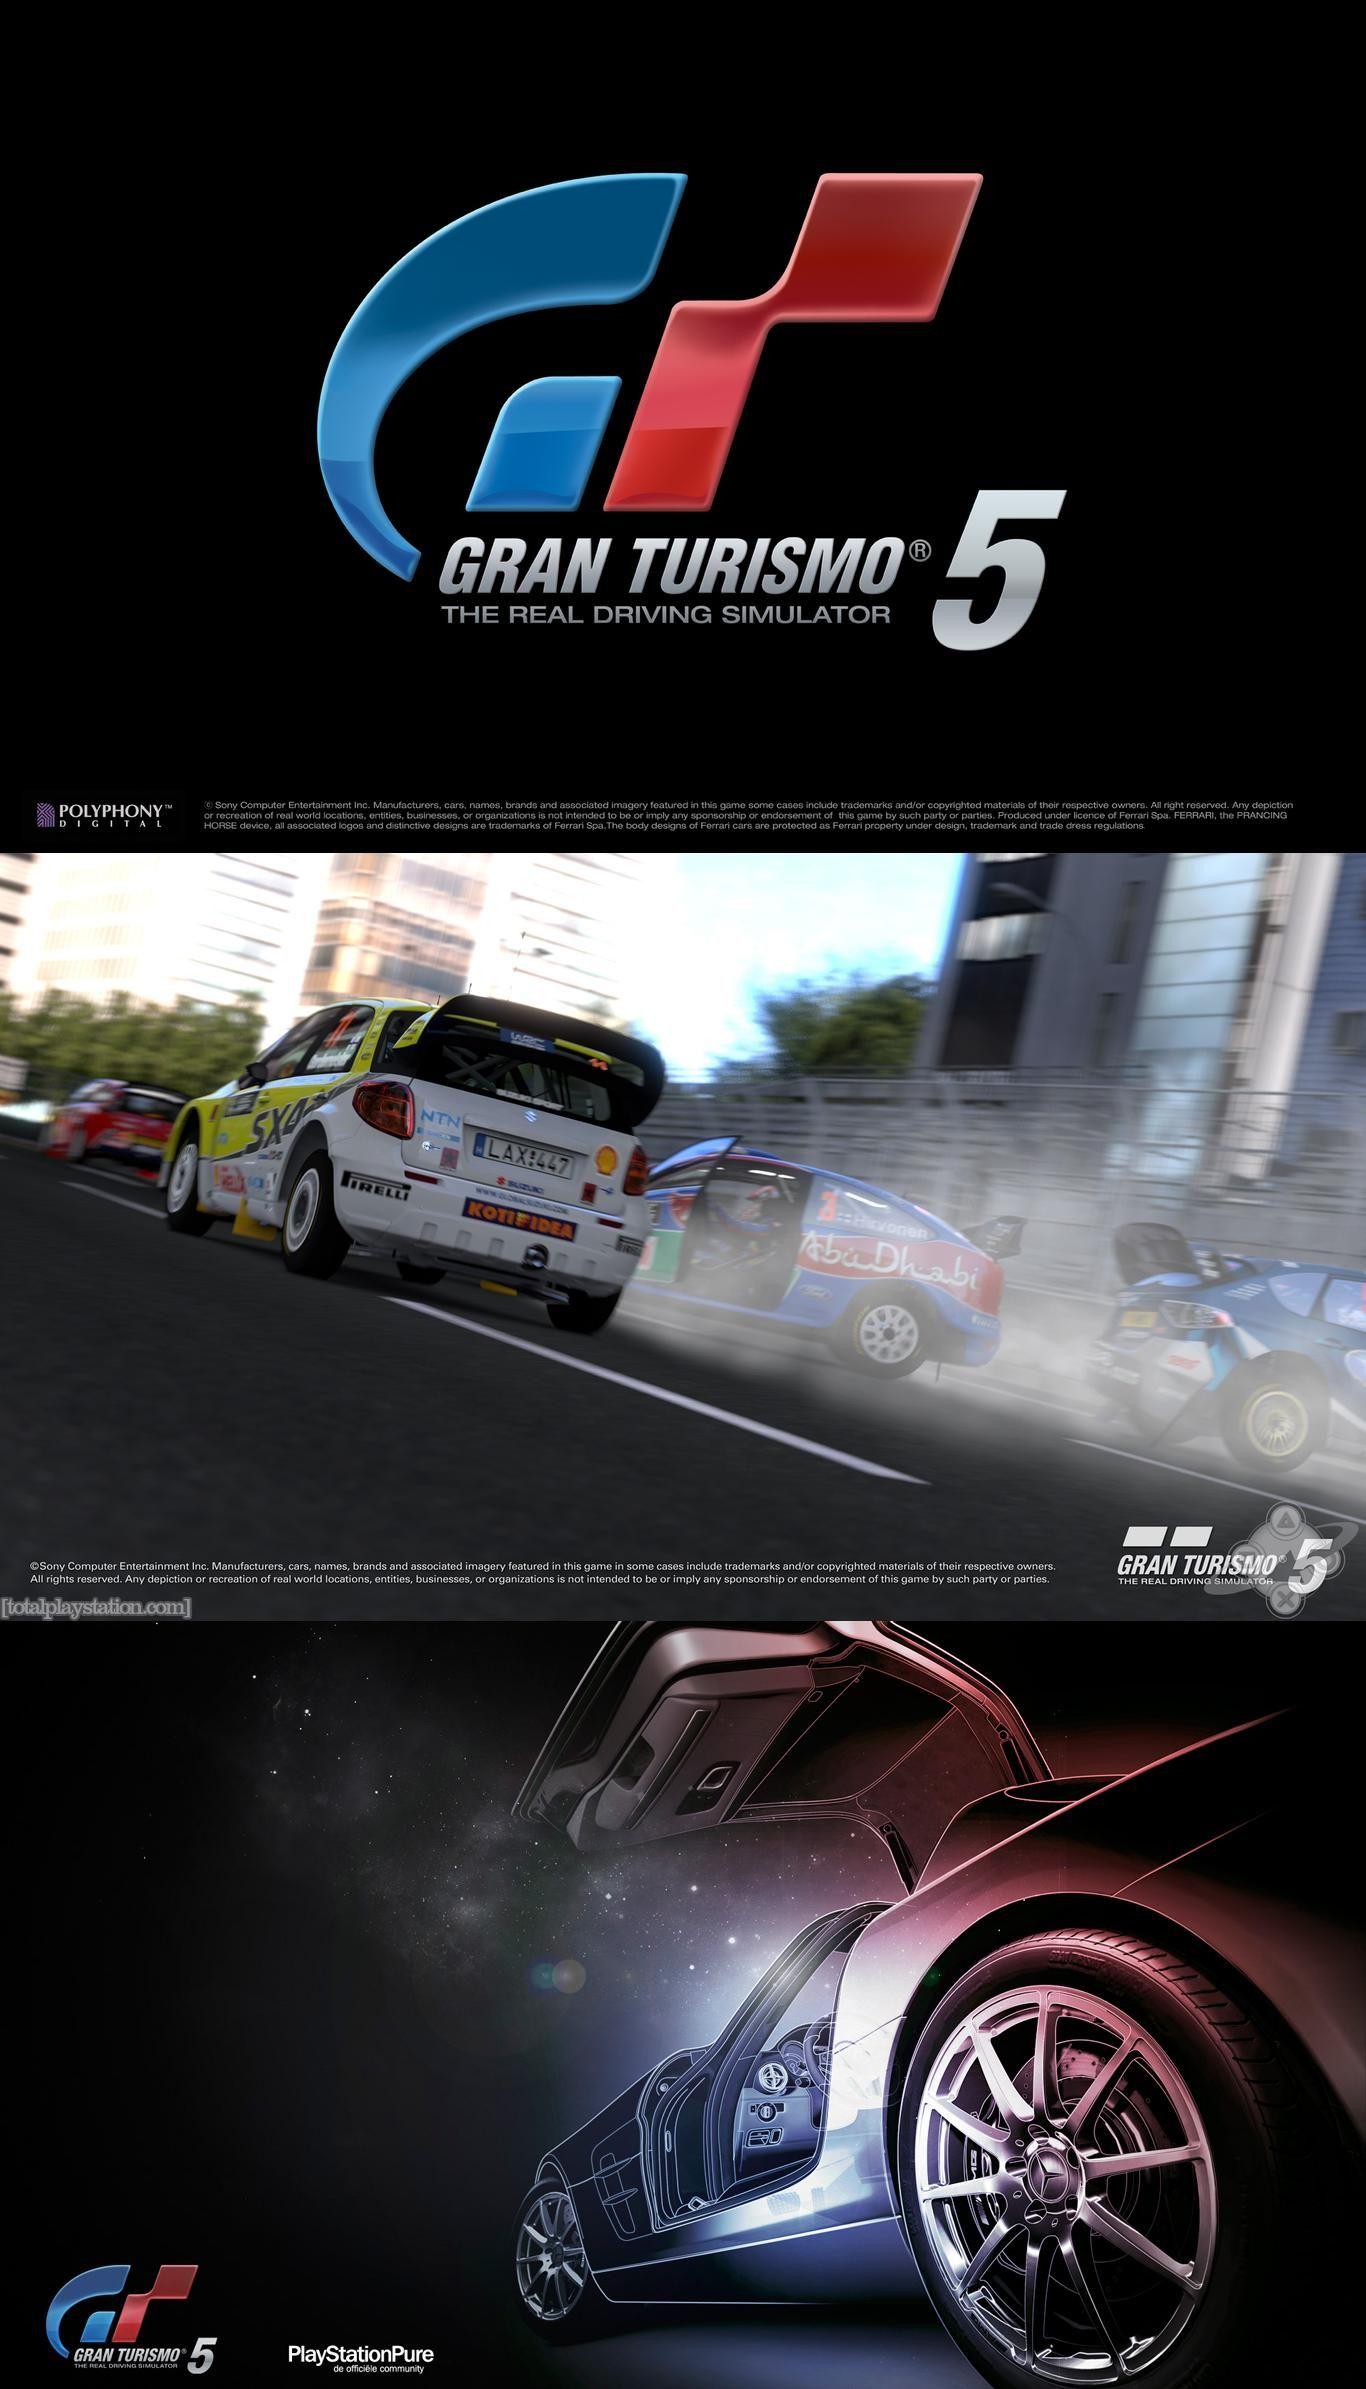 Gran Turismo 5 Logo Video games, Turismo, Simulation